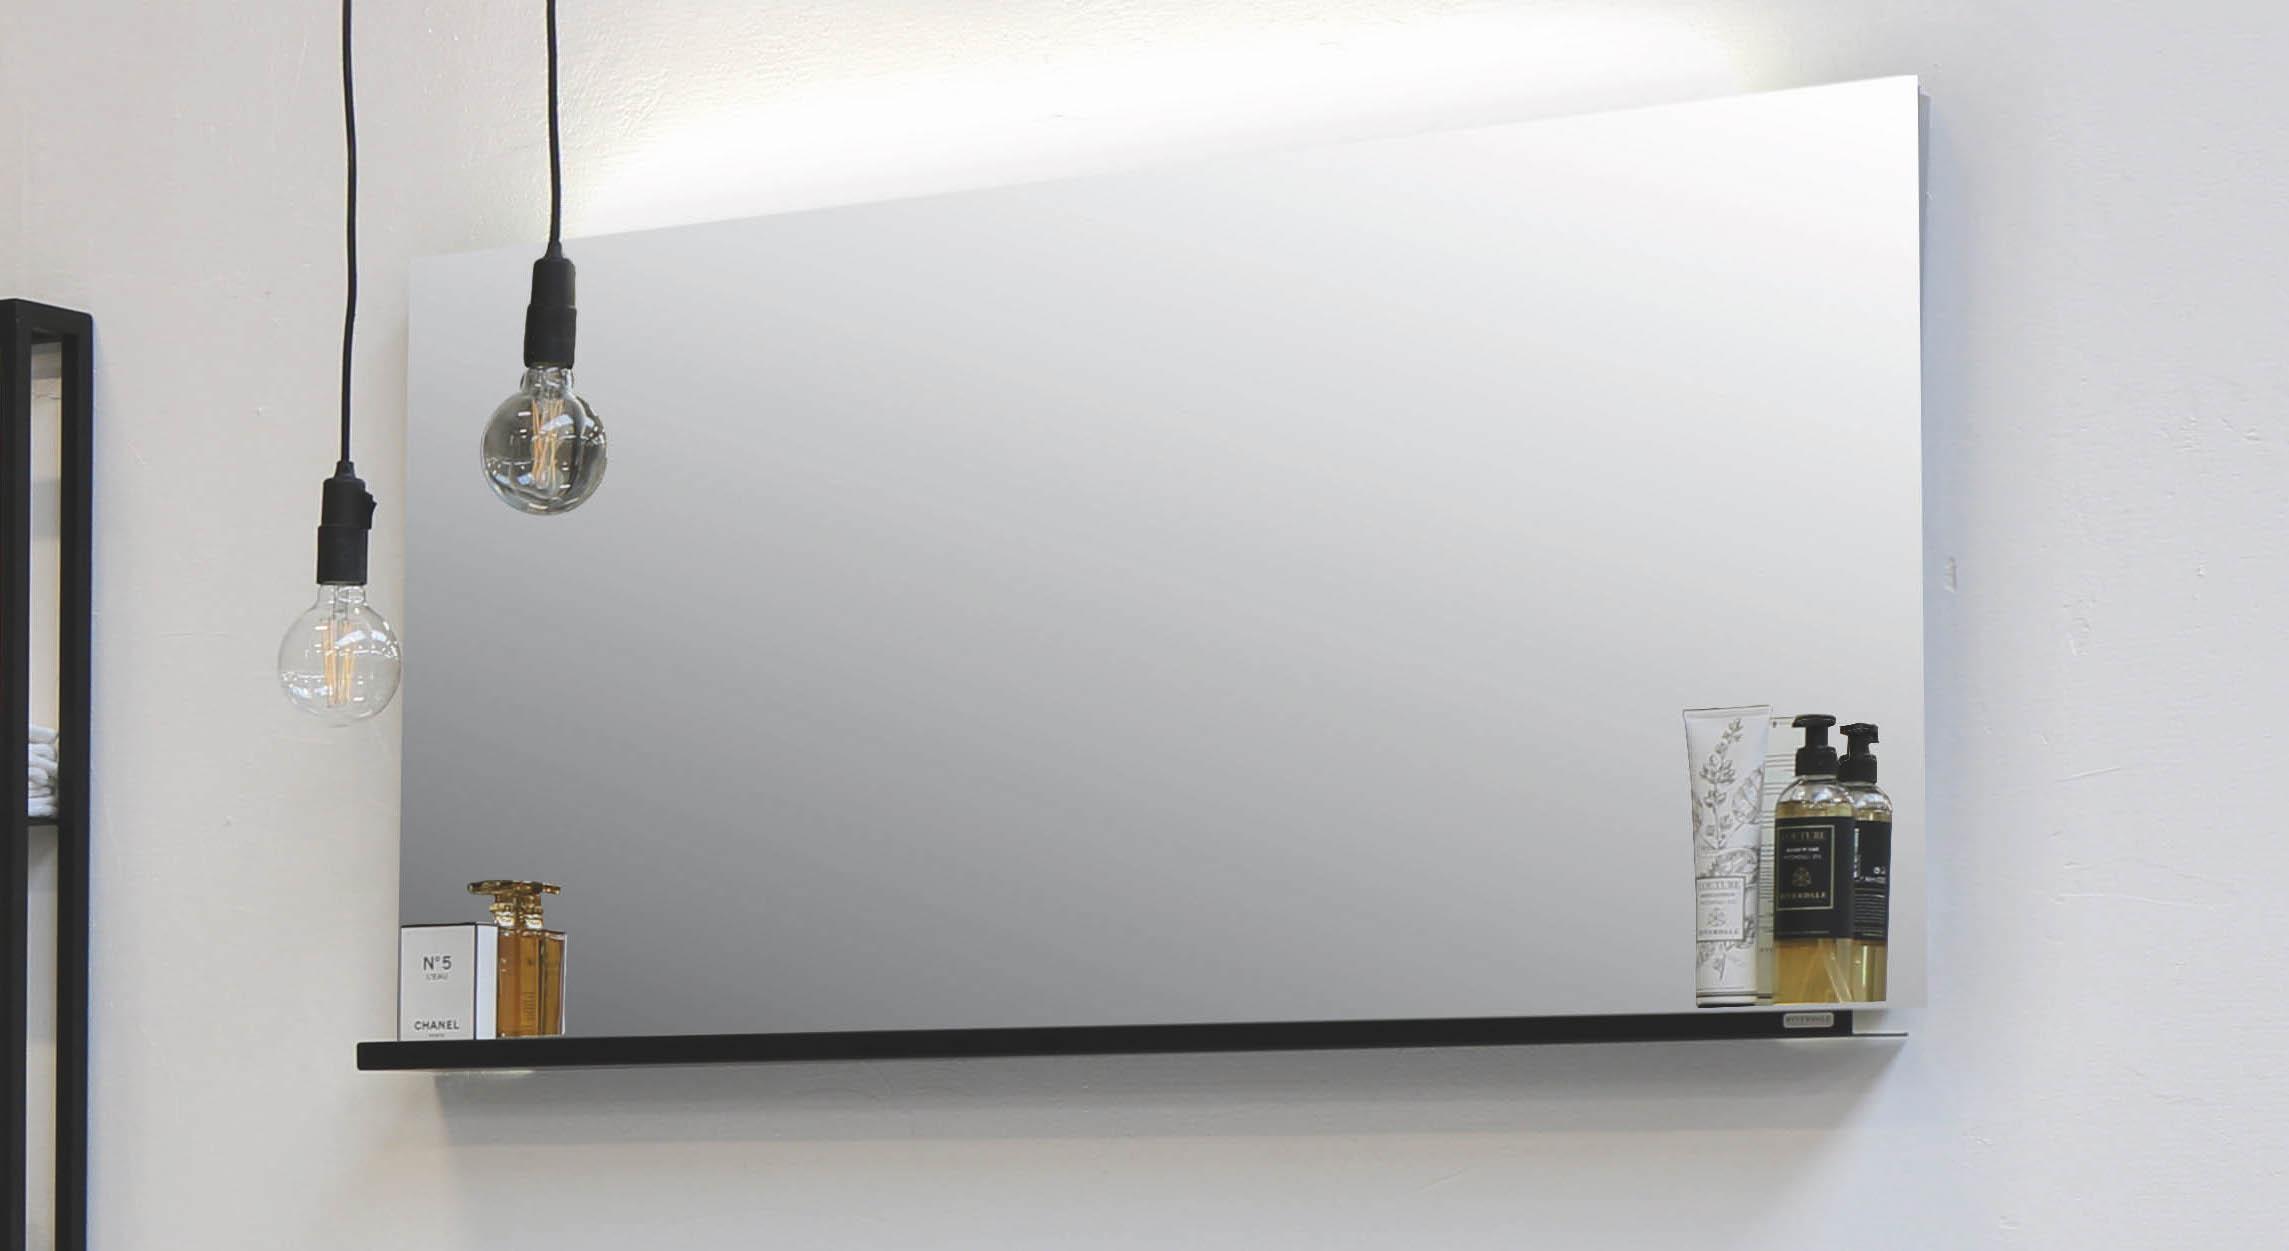 Riverdale spiegel met indirecte led boven- en onderverlichting - alu 700x30mm (bxd)